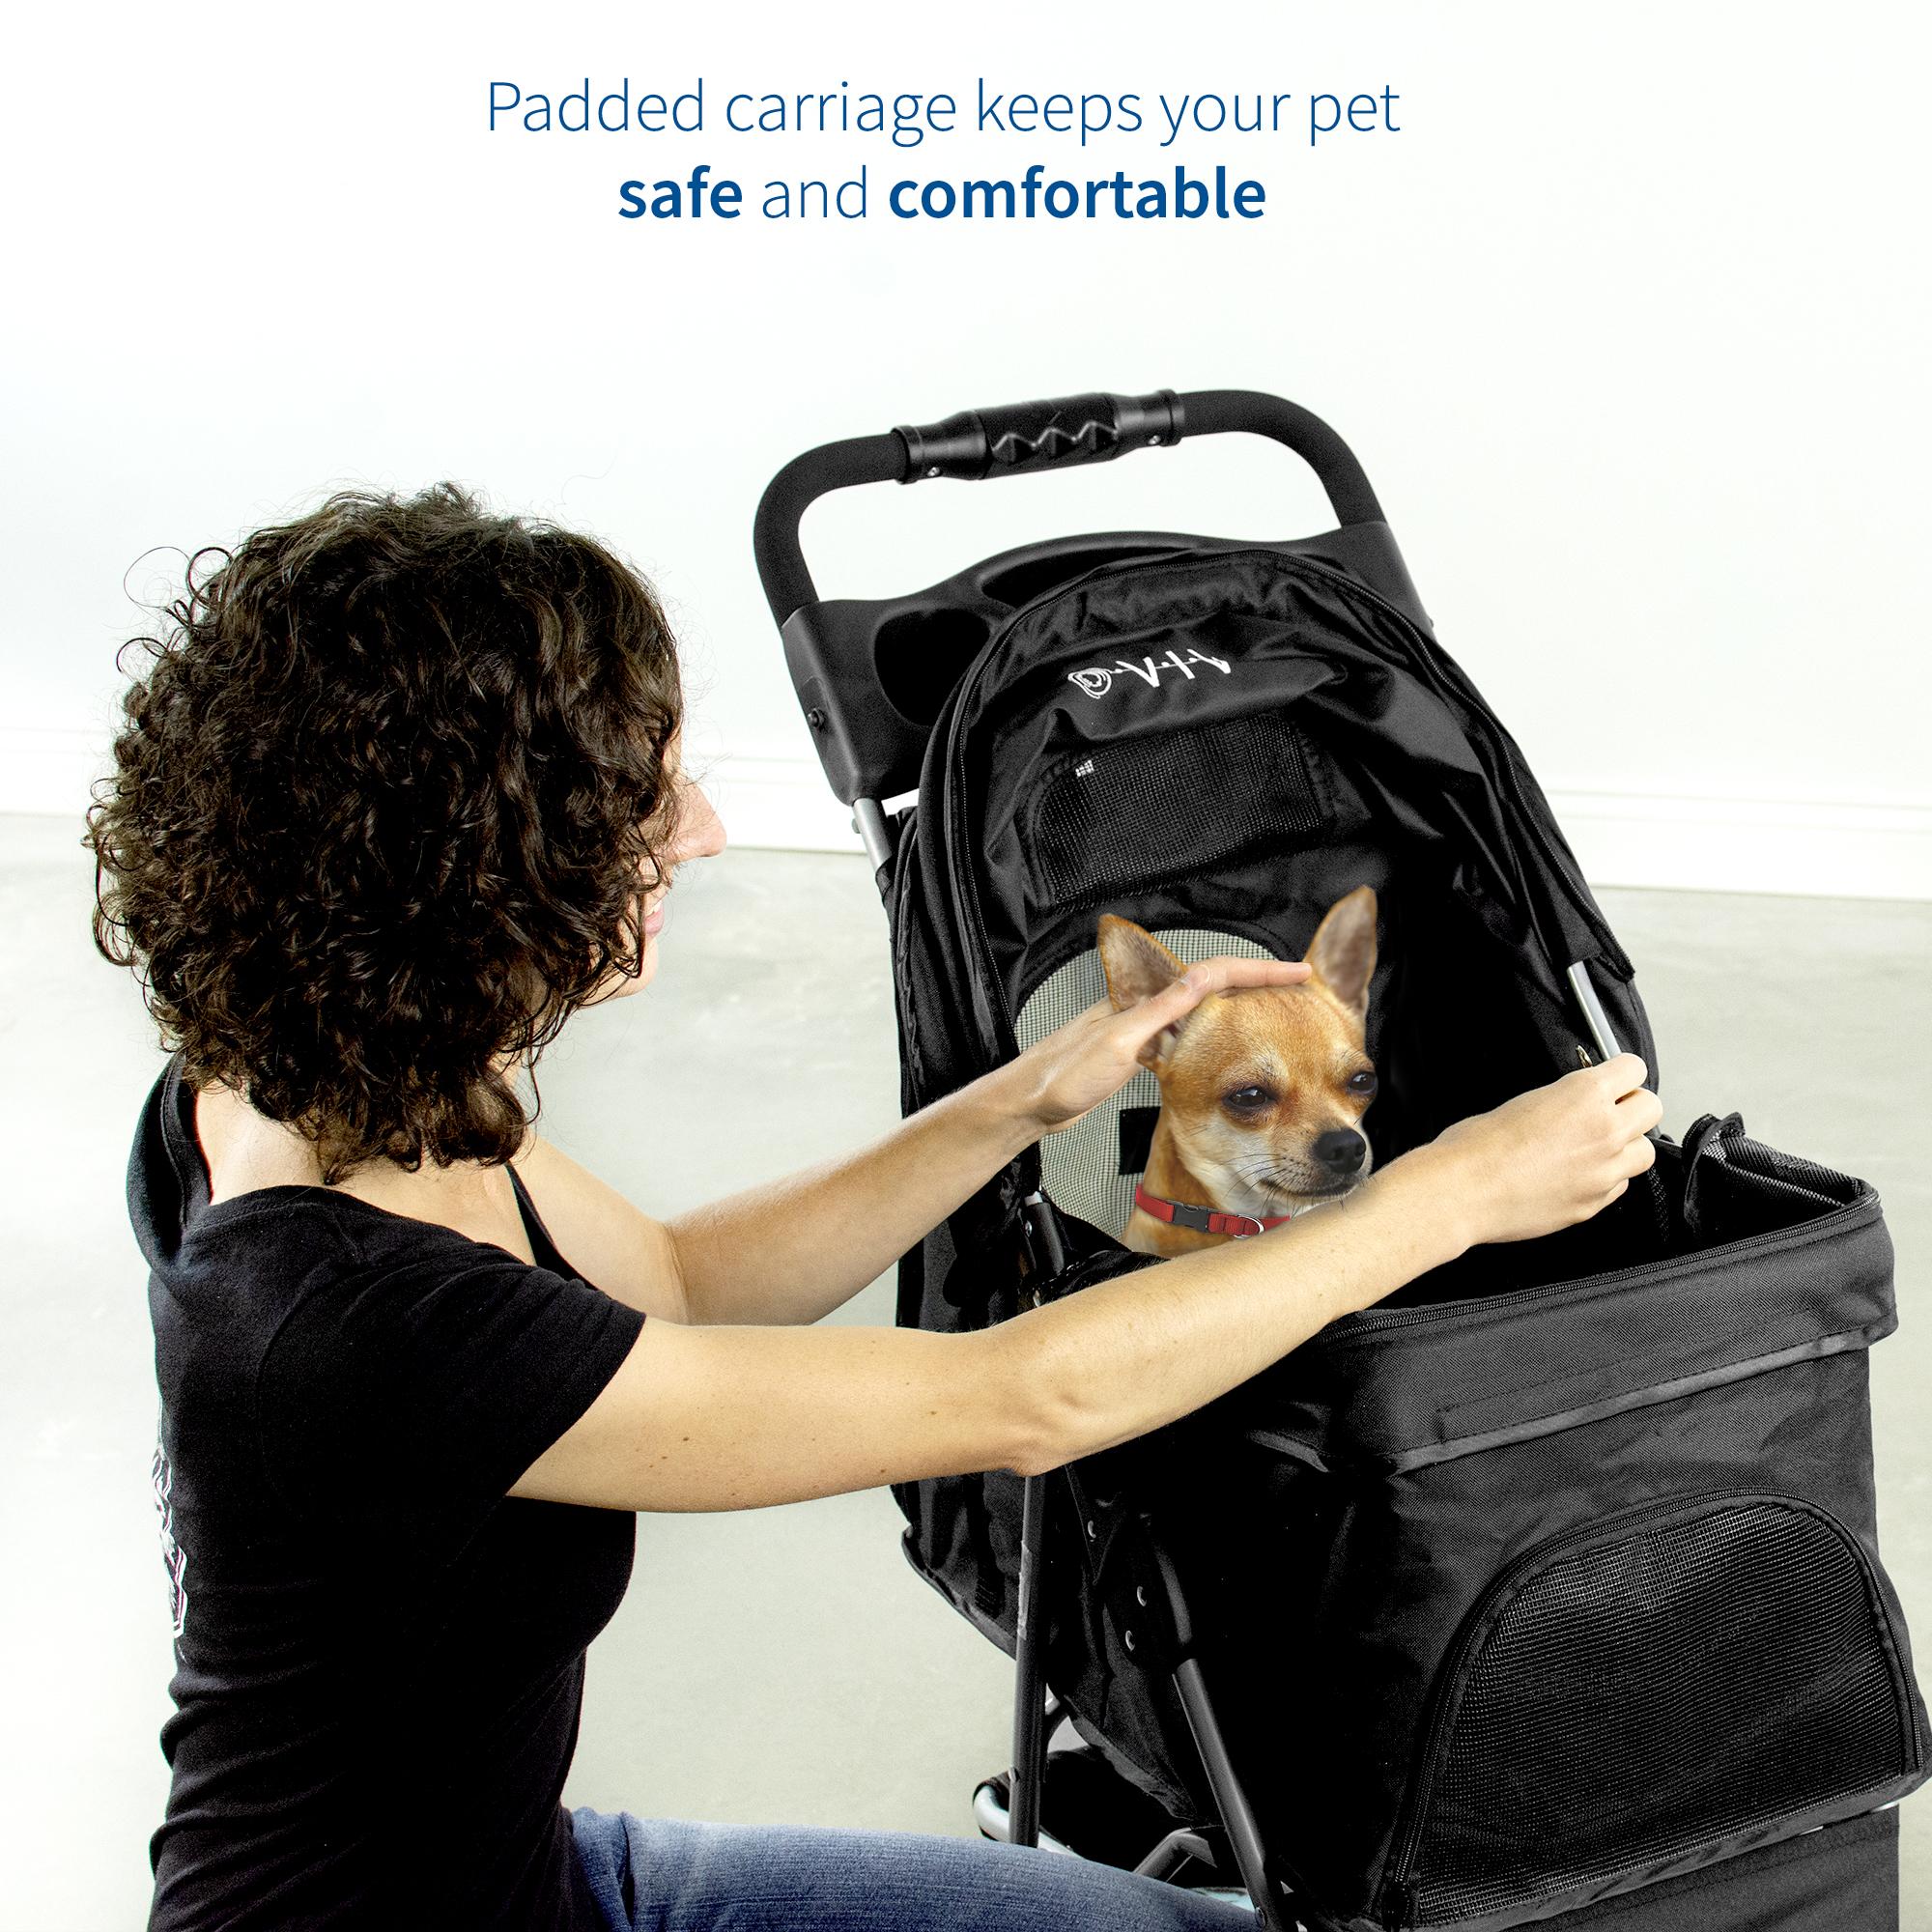 thumbnail 7 - VIVO Three Wheel Pet Stroller / Cat & Dog Foldable Carrier Strolling Cart